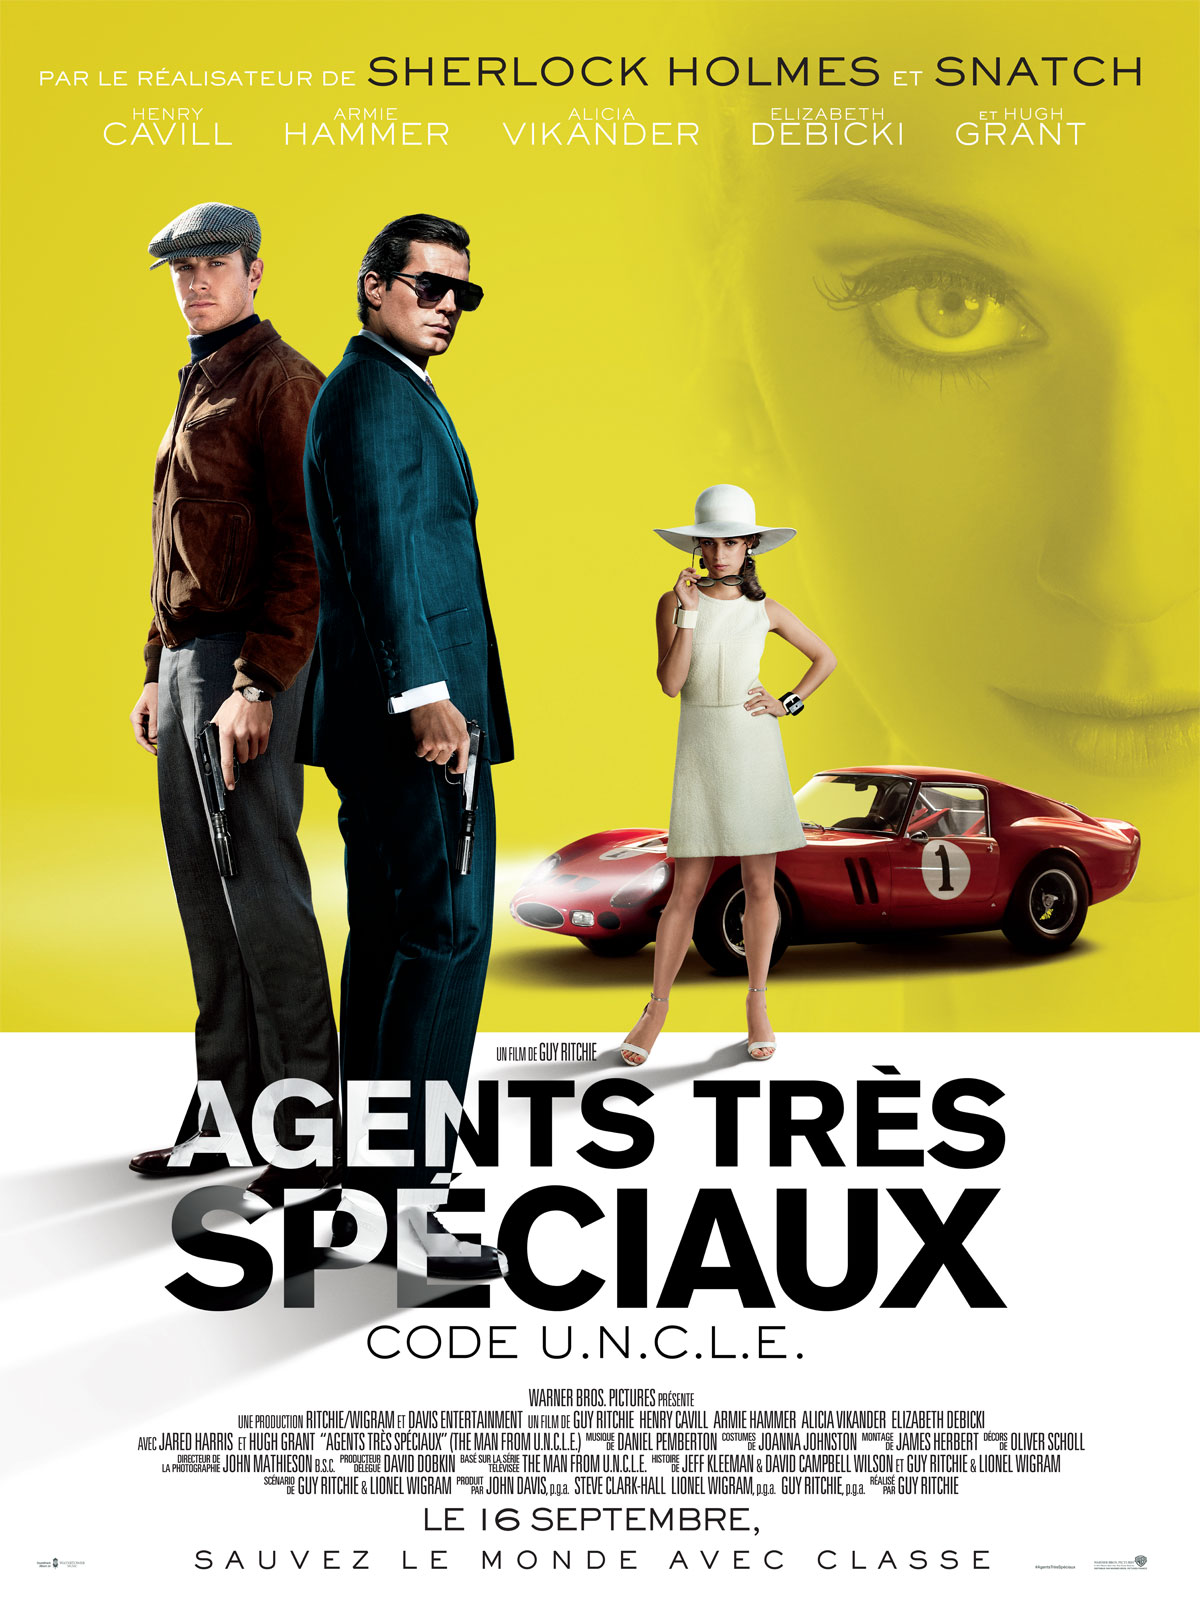 Agents très spéciaux Code U.N.C.L.E